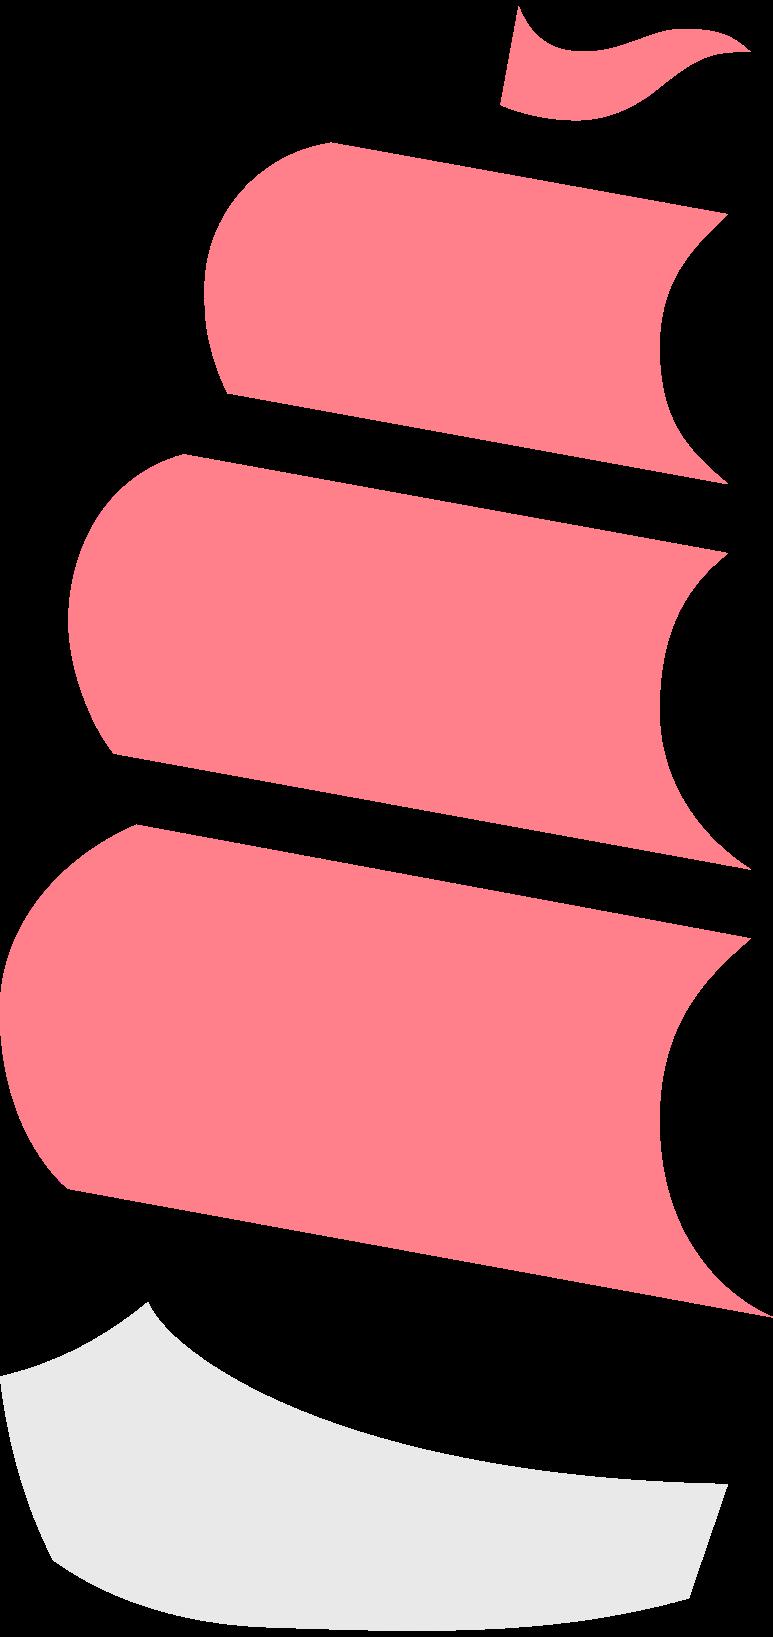 ship Clipart illustration in PNG, SVG